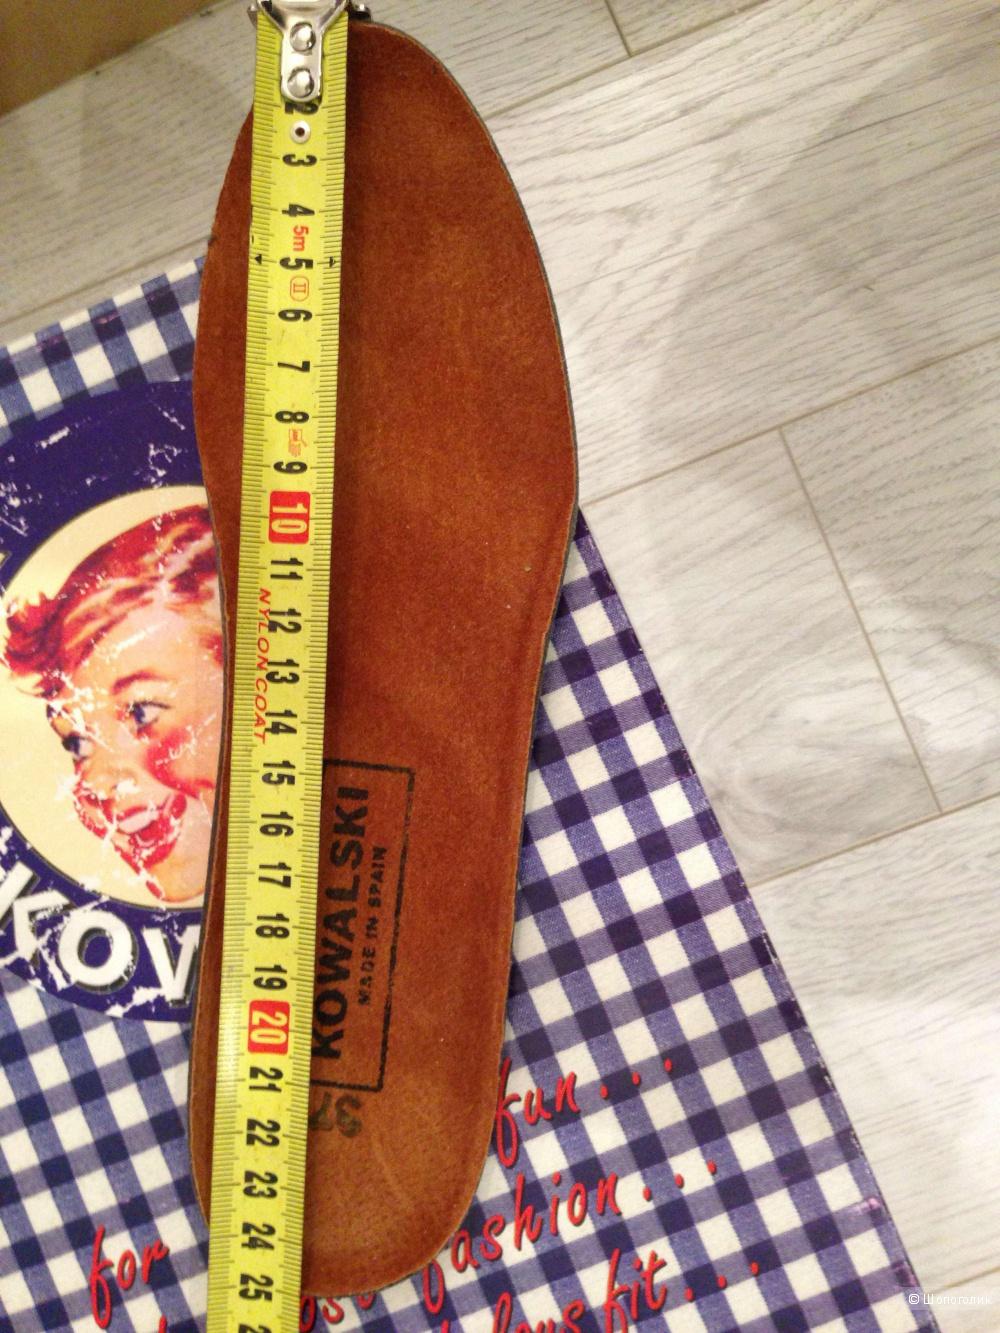 Кроссовки Kowalski, на русский 37,5-38 размер